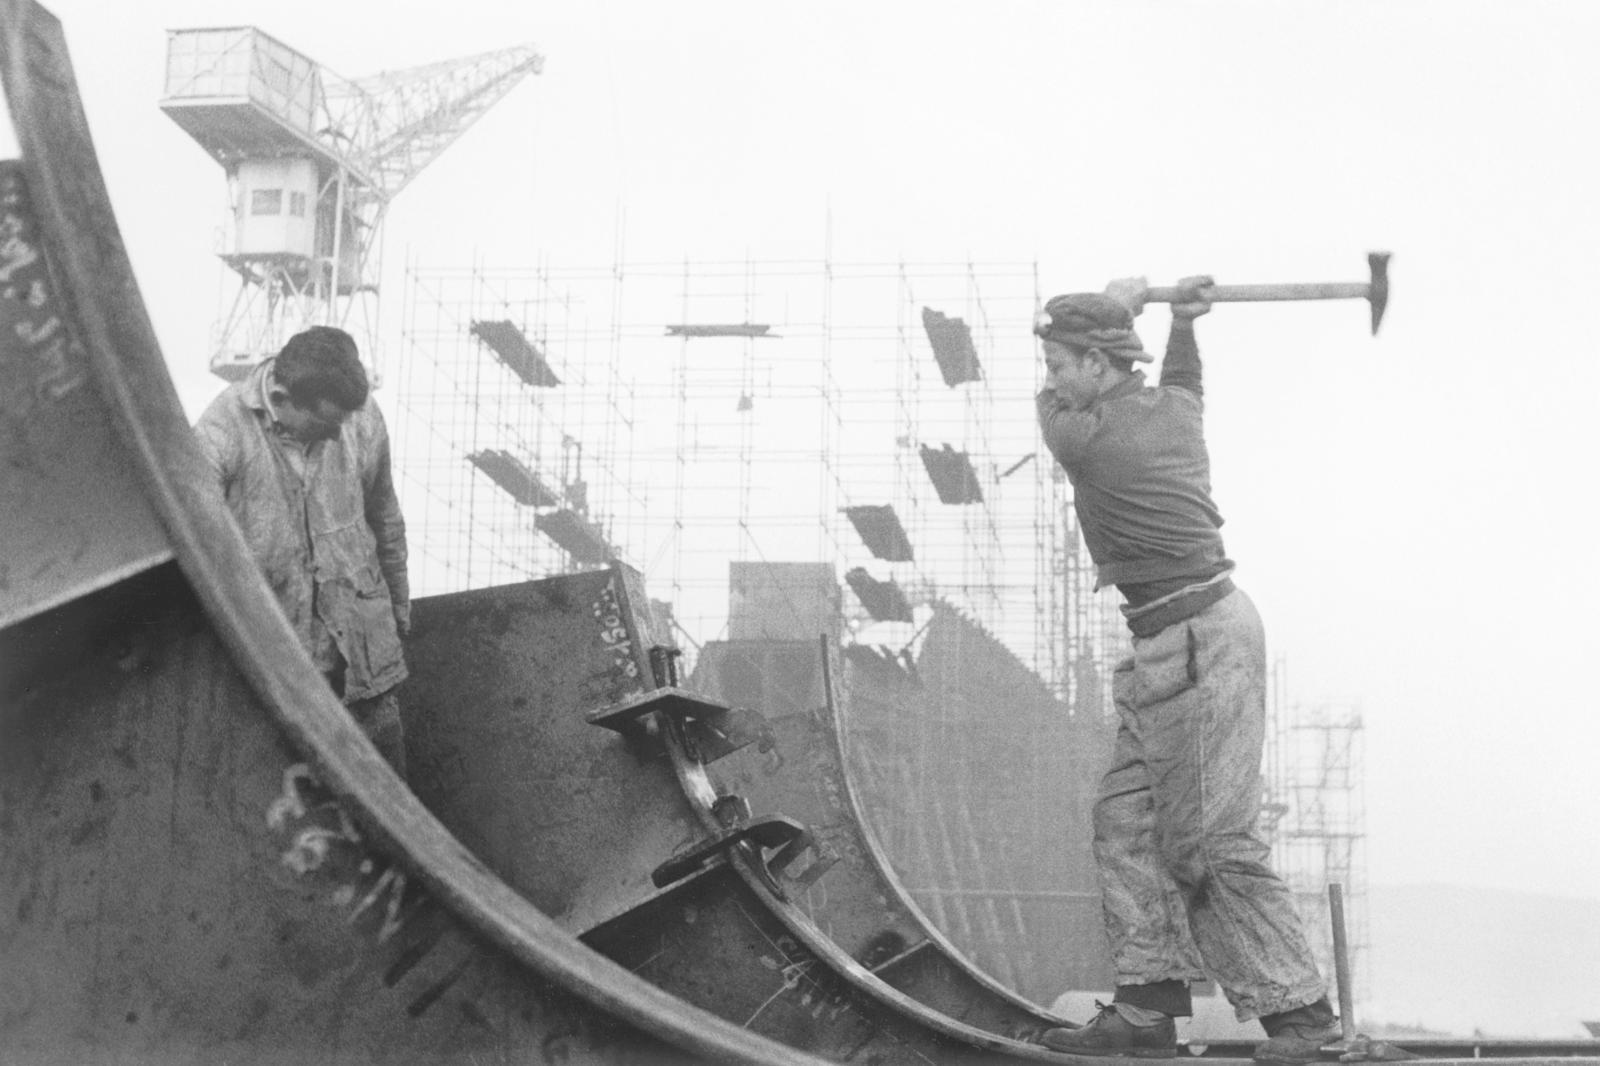 « La Ciotat », Sans titre, 1958 © Jean Marquis